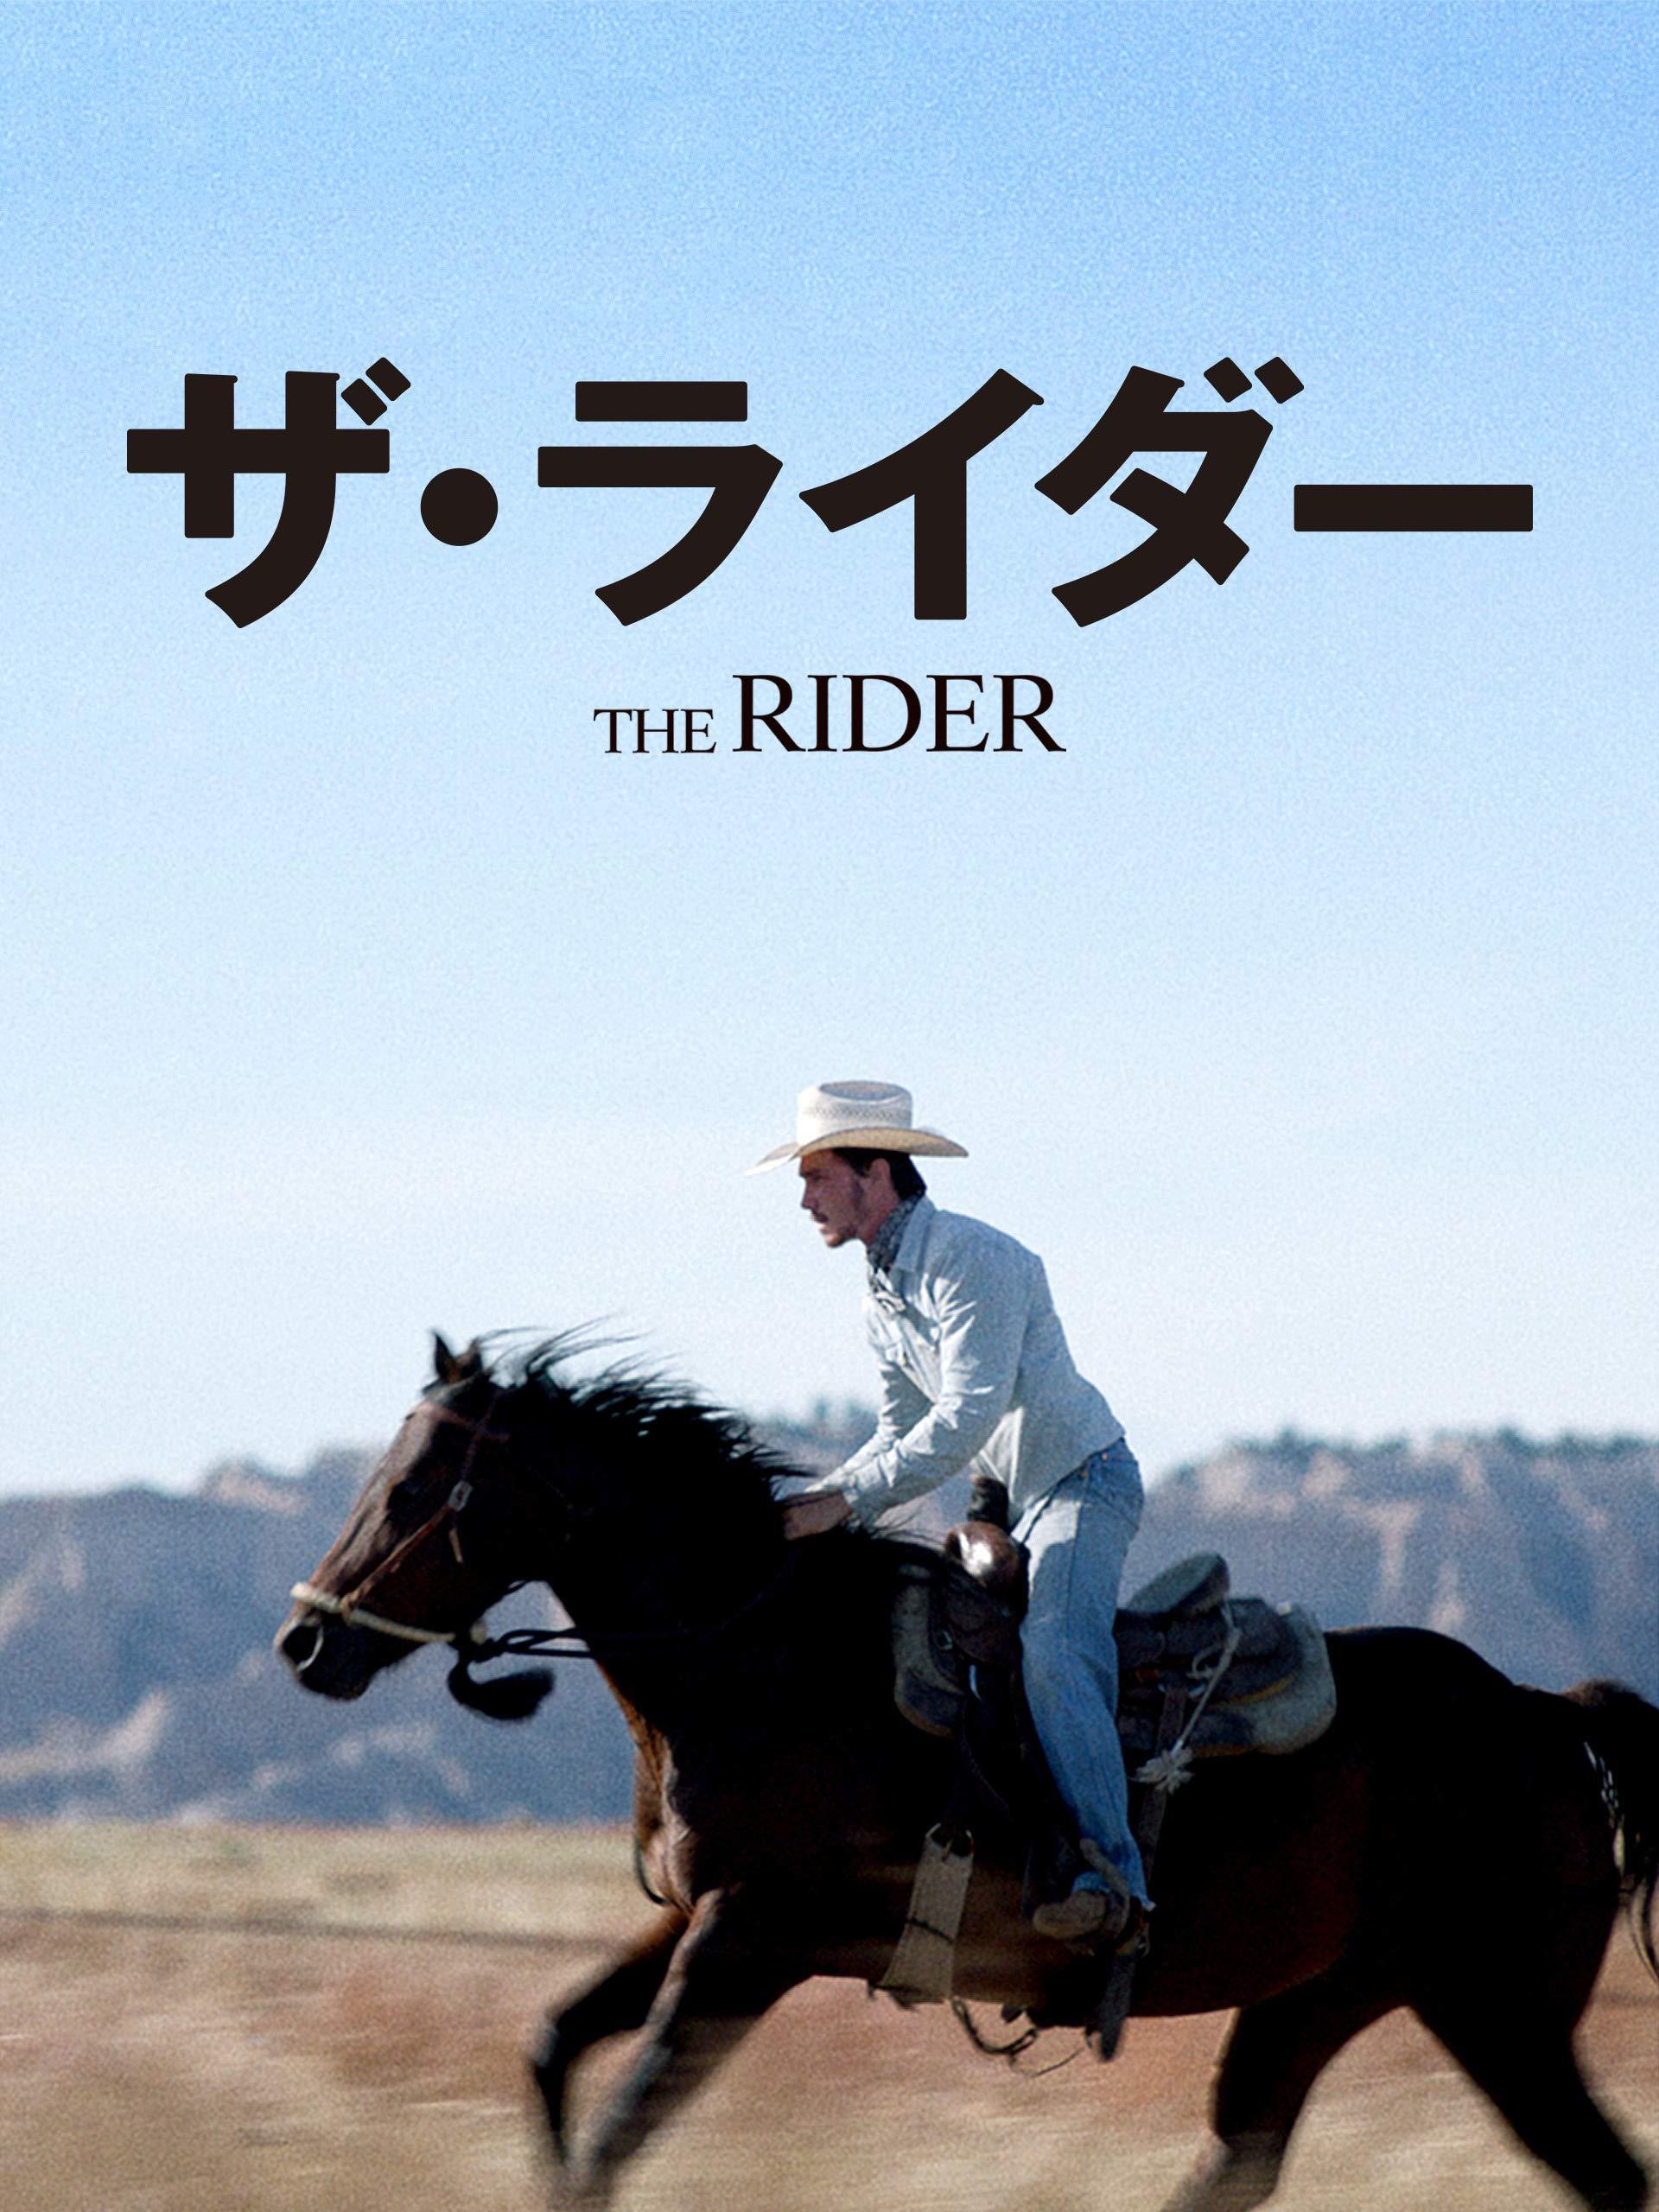 Amazon.co.jp: ザ・ライダー (字幕版)を観る | Prime Video